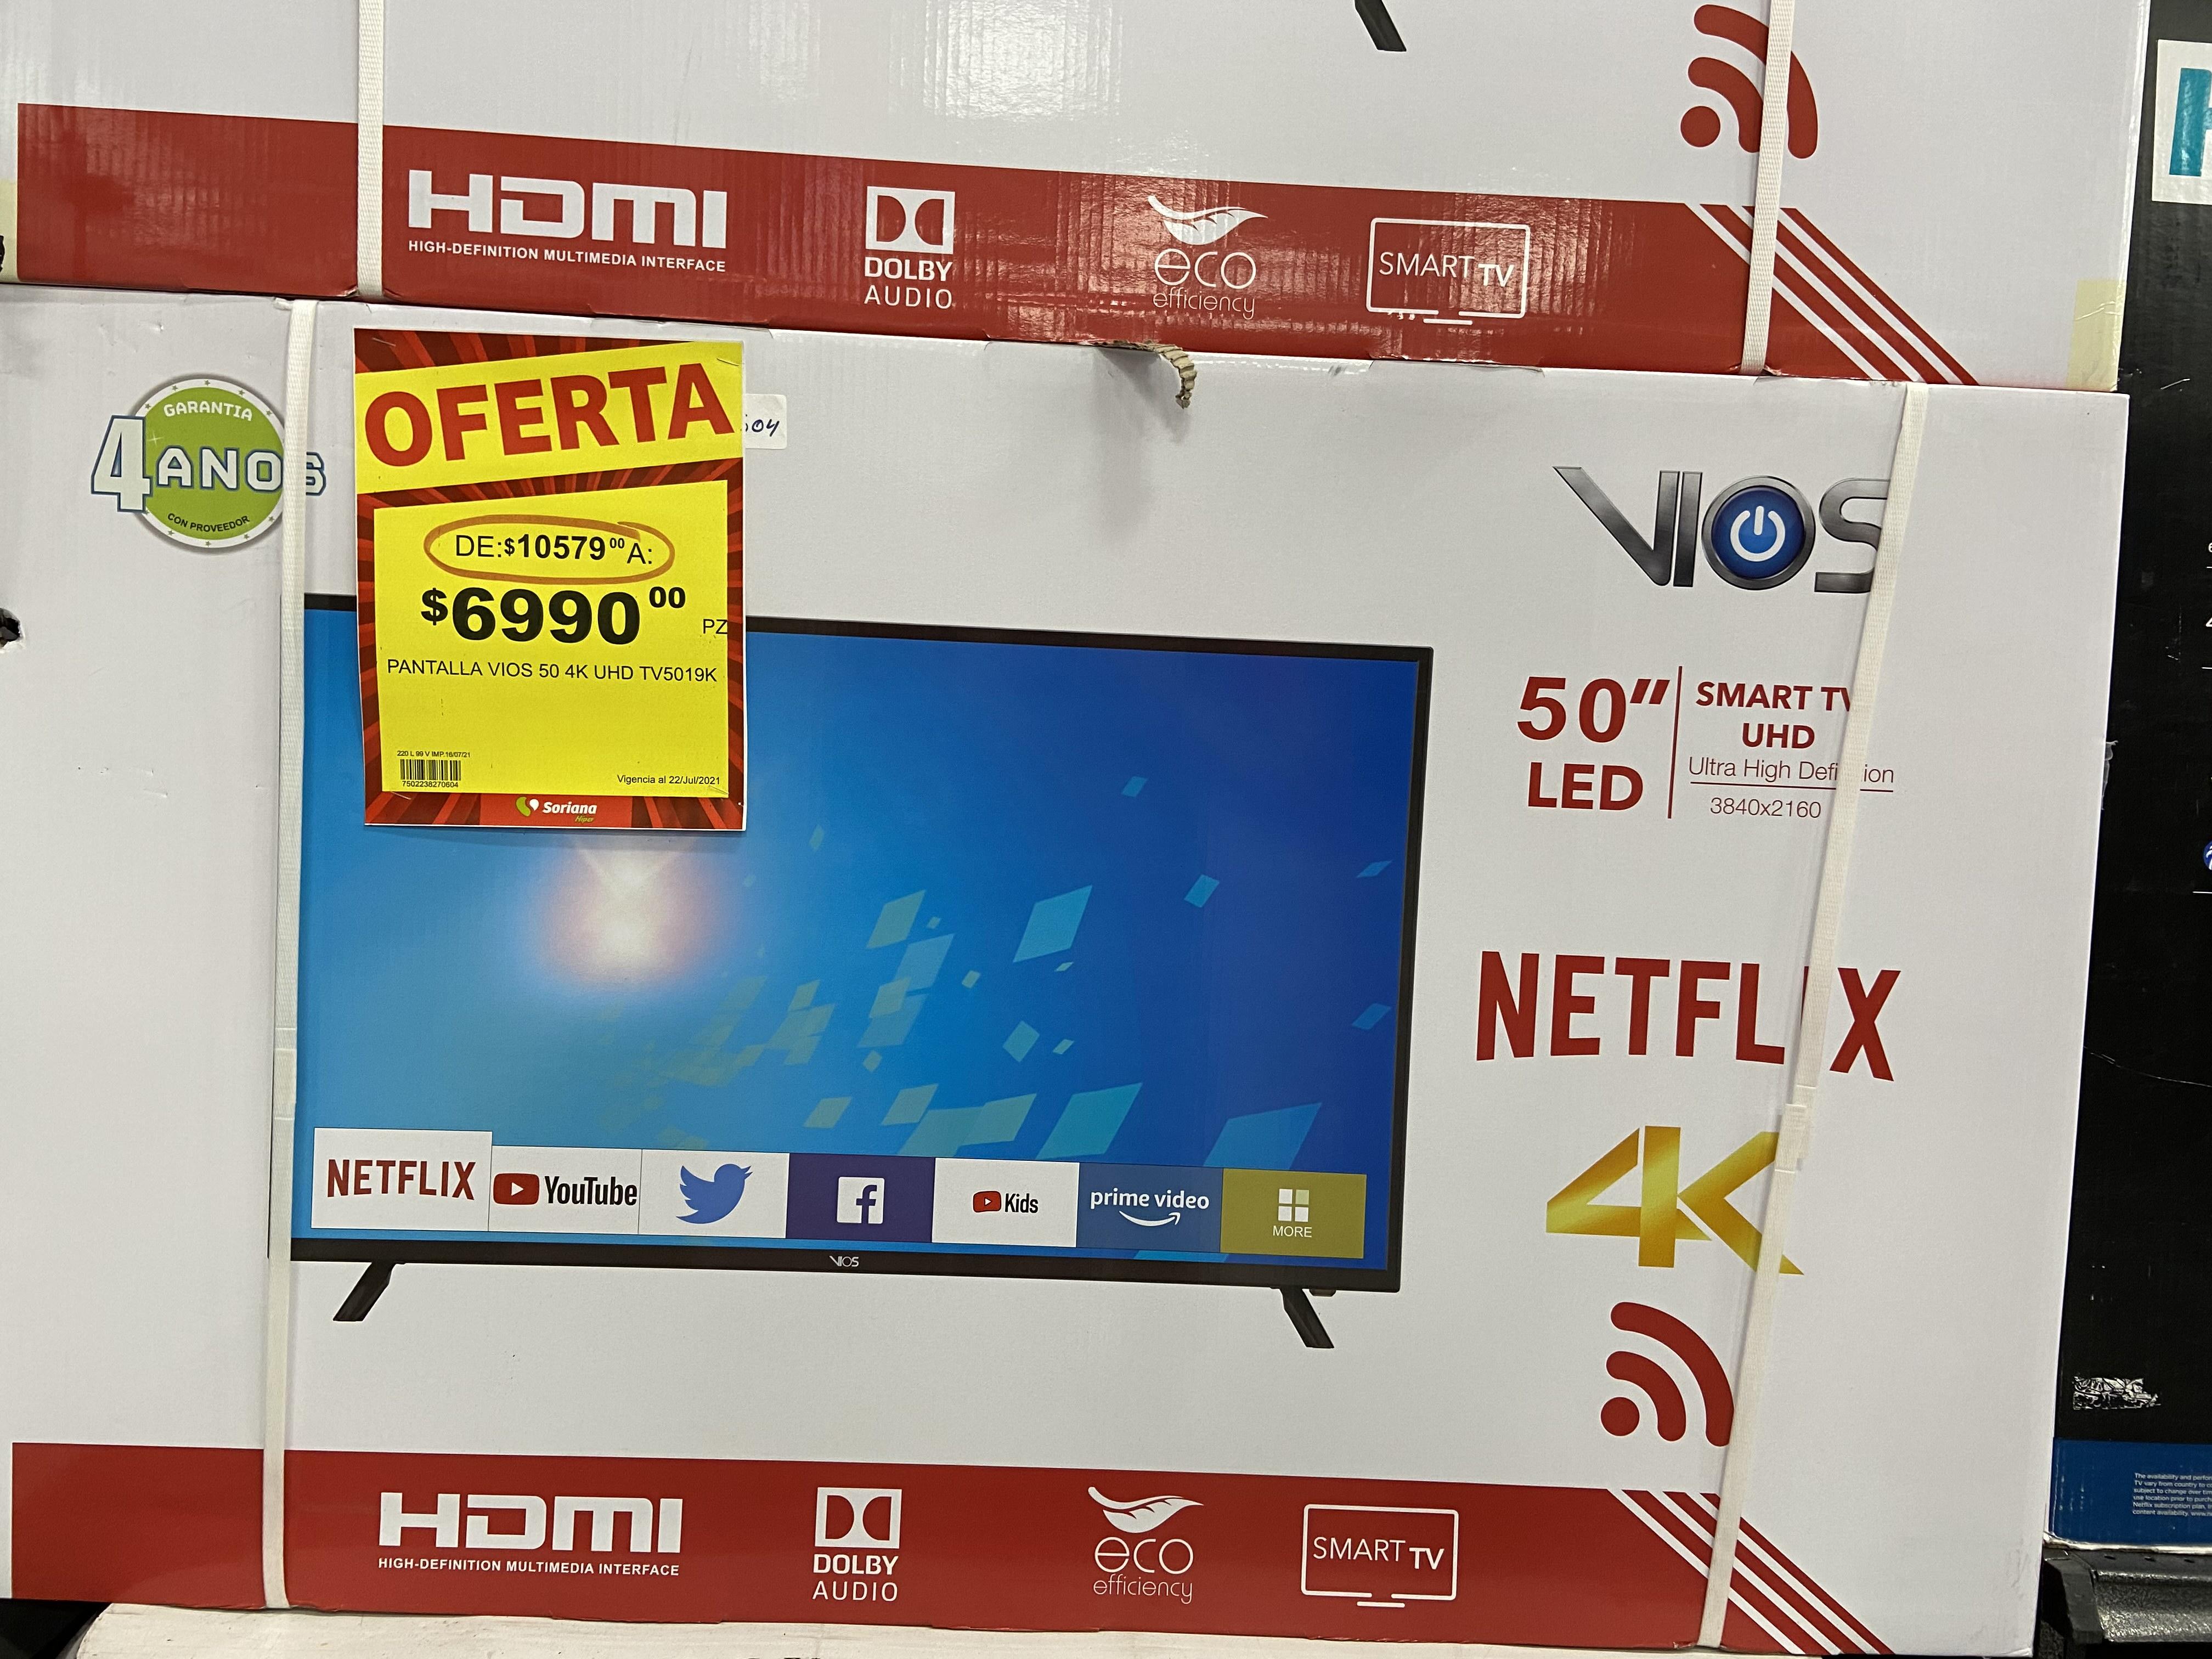 Soriana Pantalla VIOS 4K smart TVs